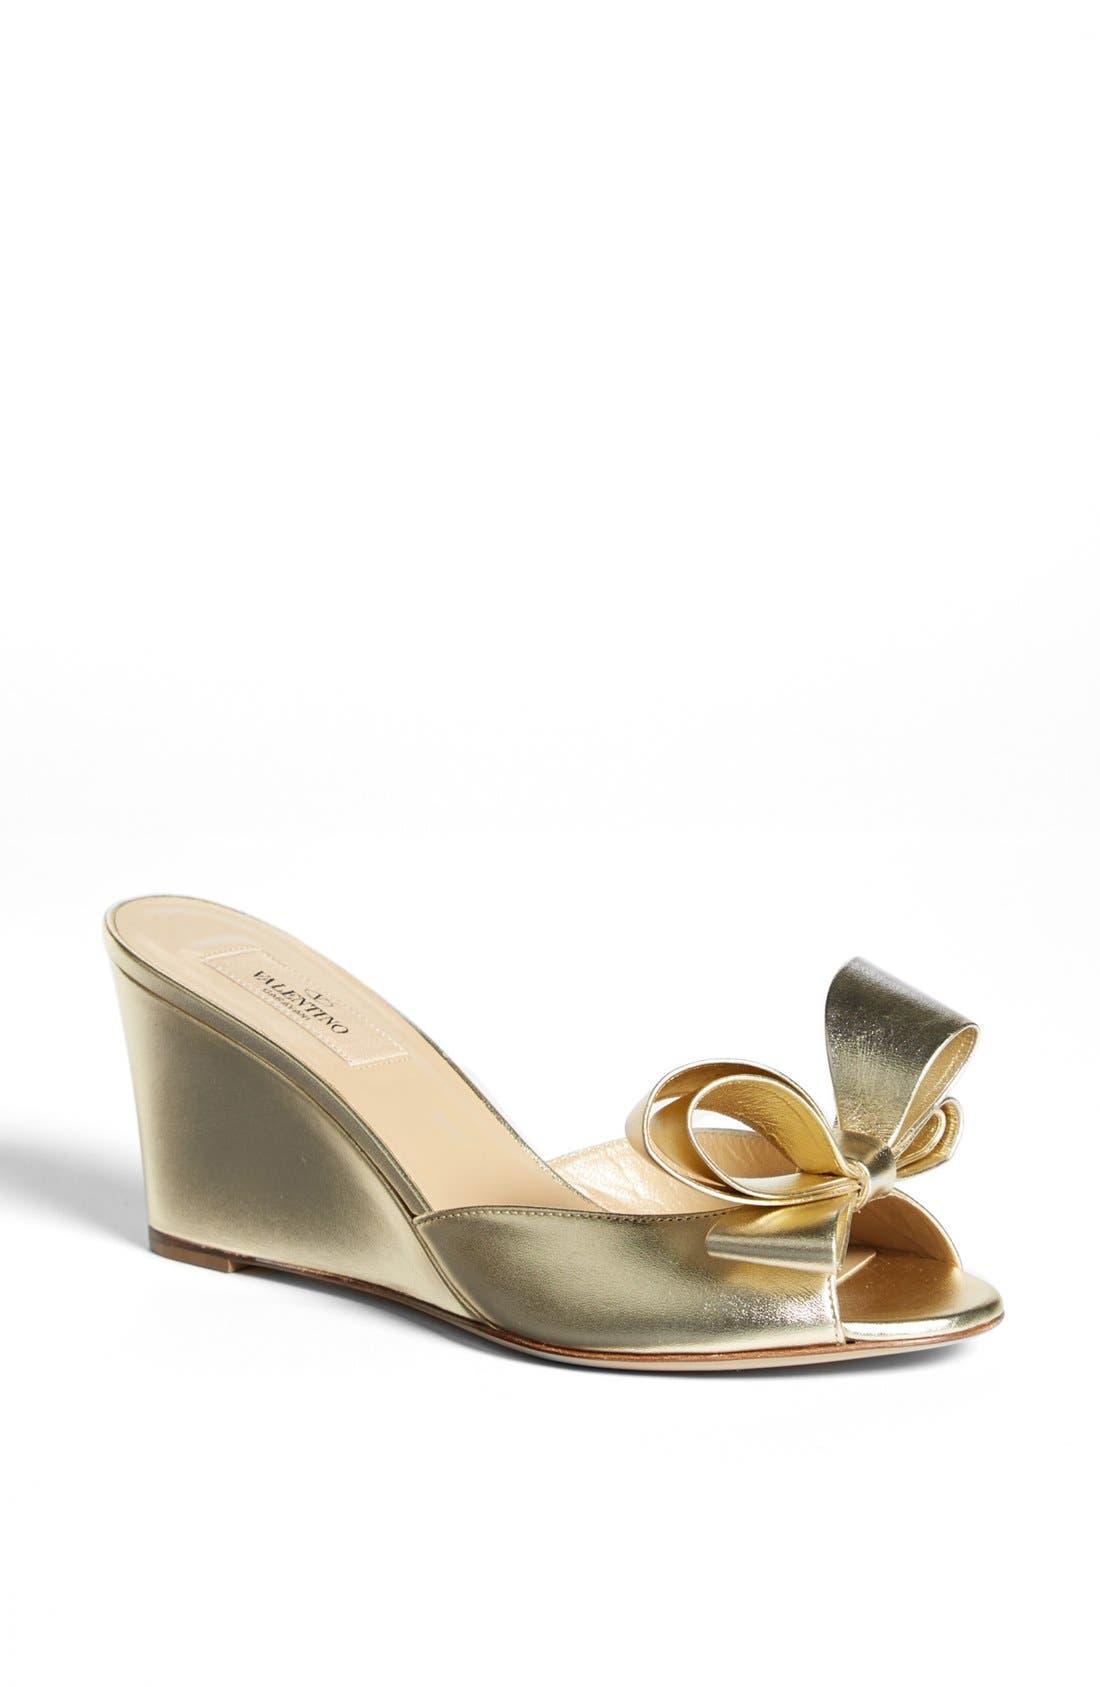 Main Image - Valentino Bow Wedge Sandal